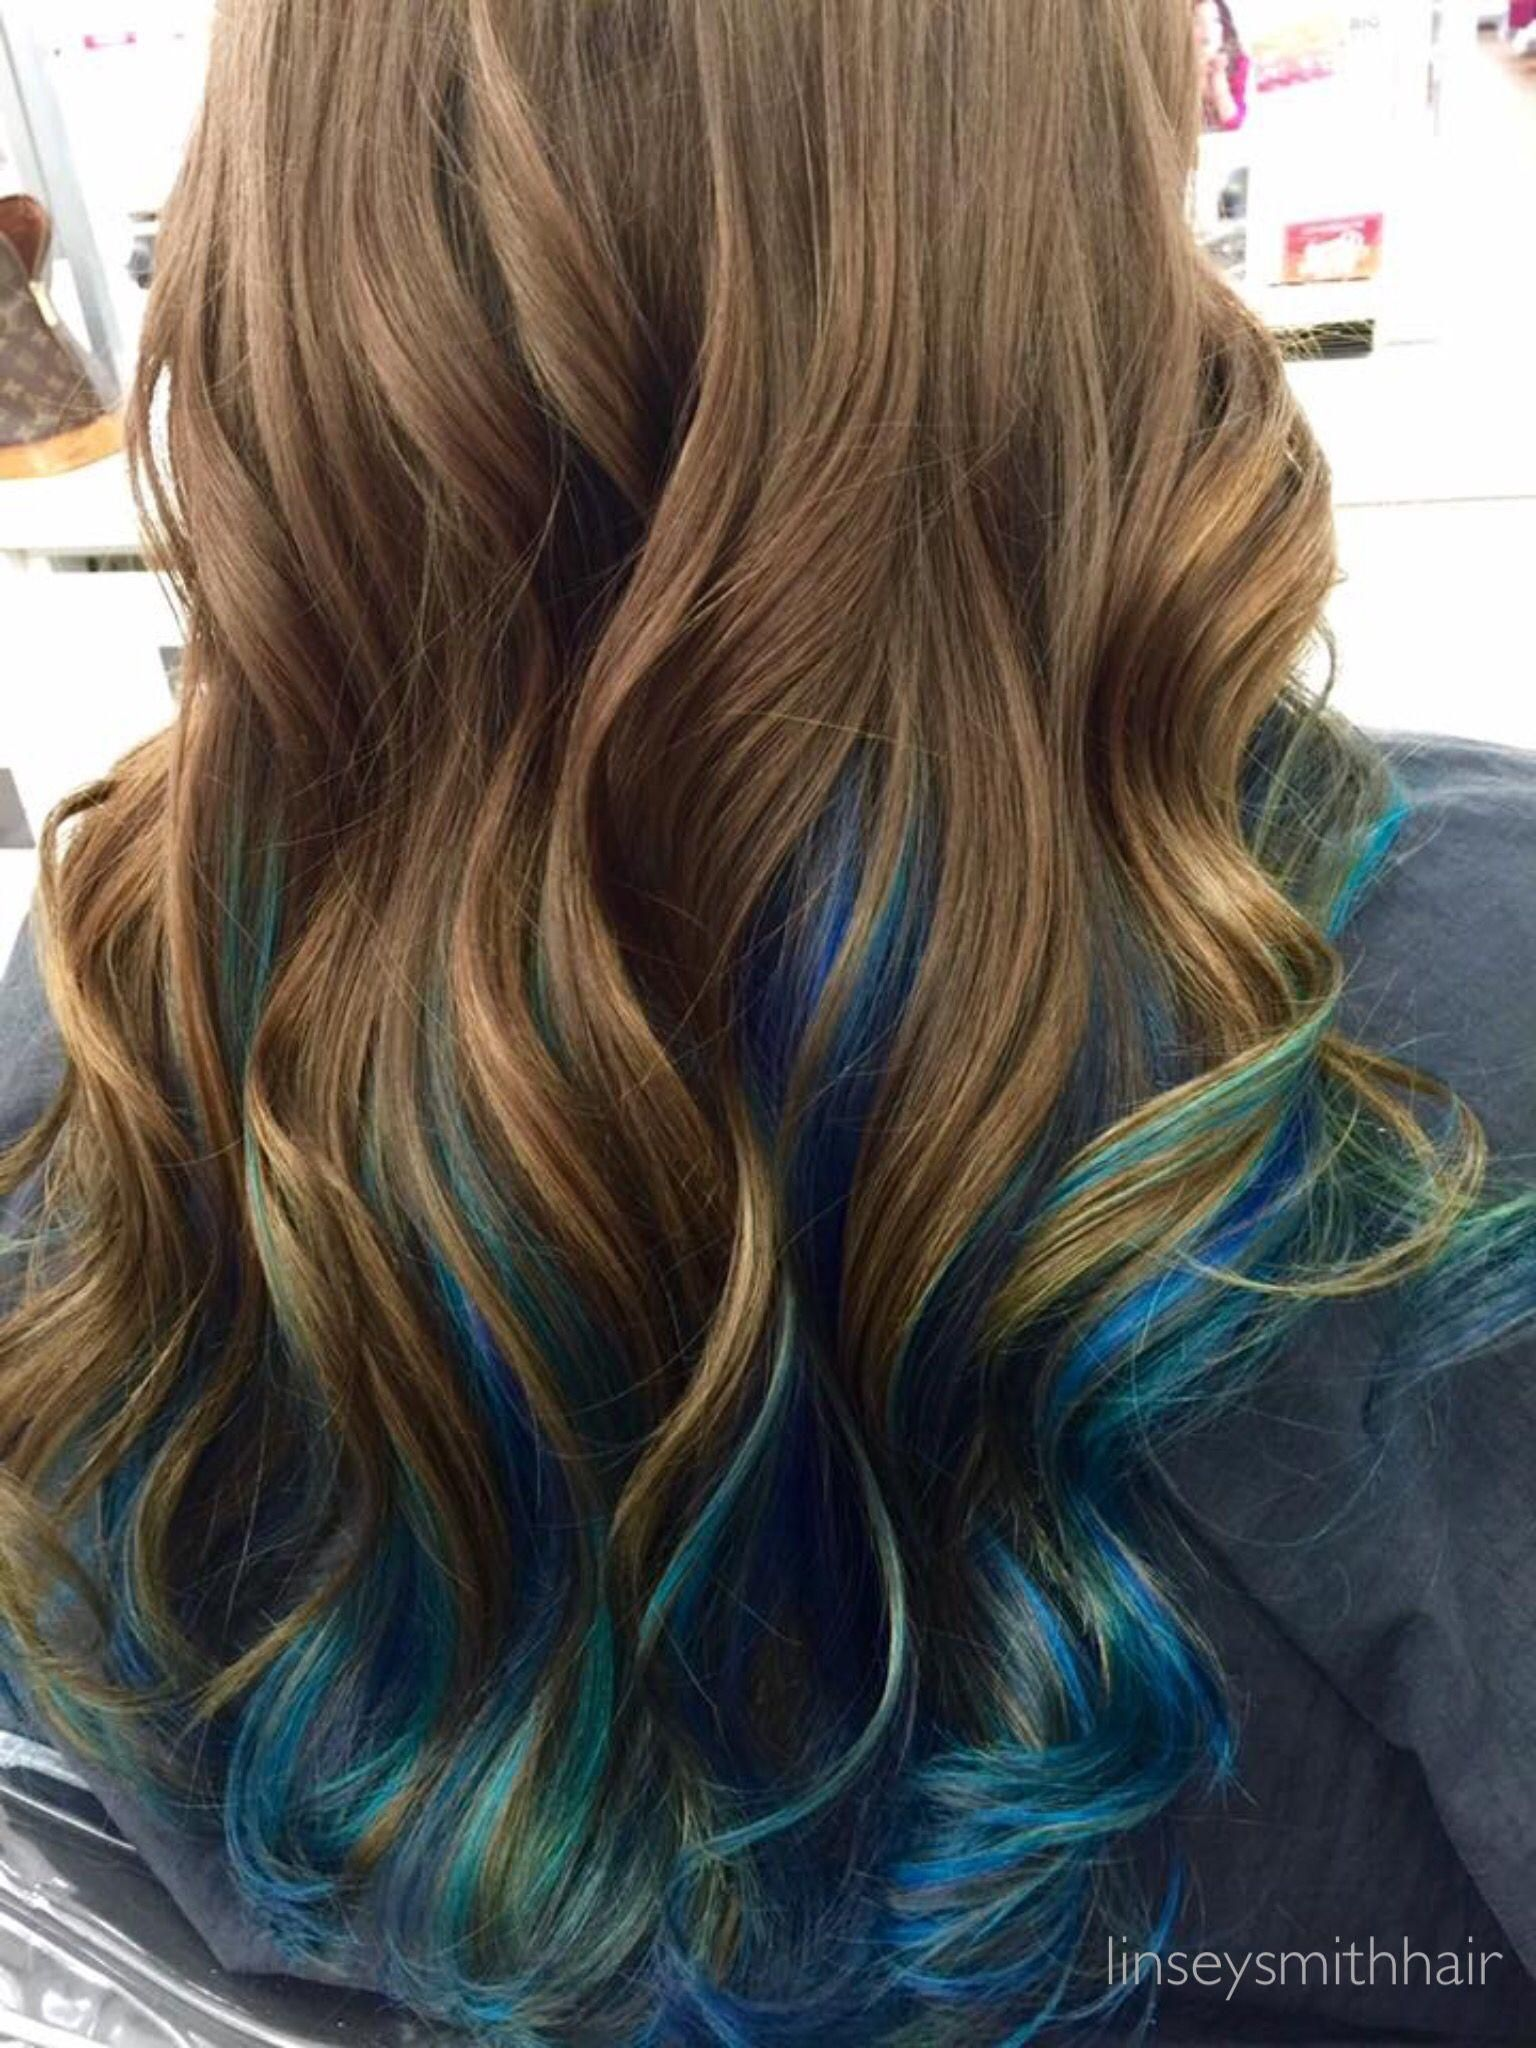 35 Captivating Peekaboo Highlights The Woman Hairstyles Blue Hair Highlights Blue Ombre Hair Peekaboo Hair